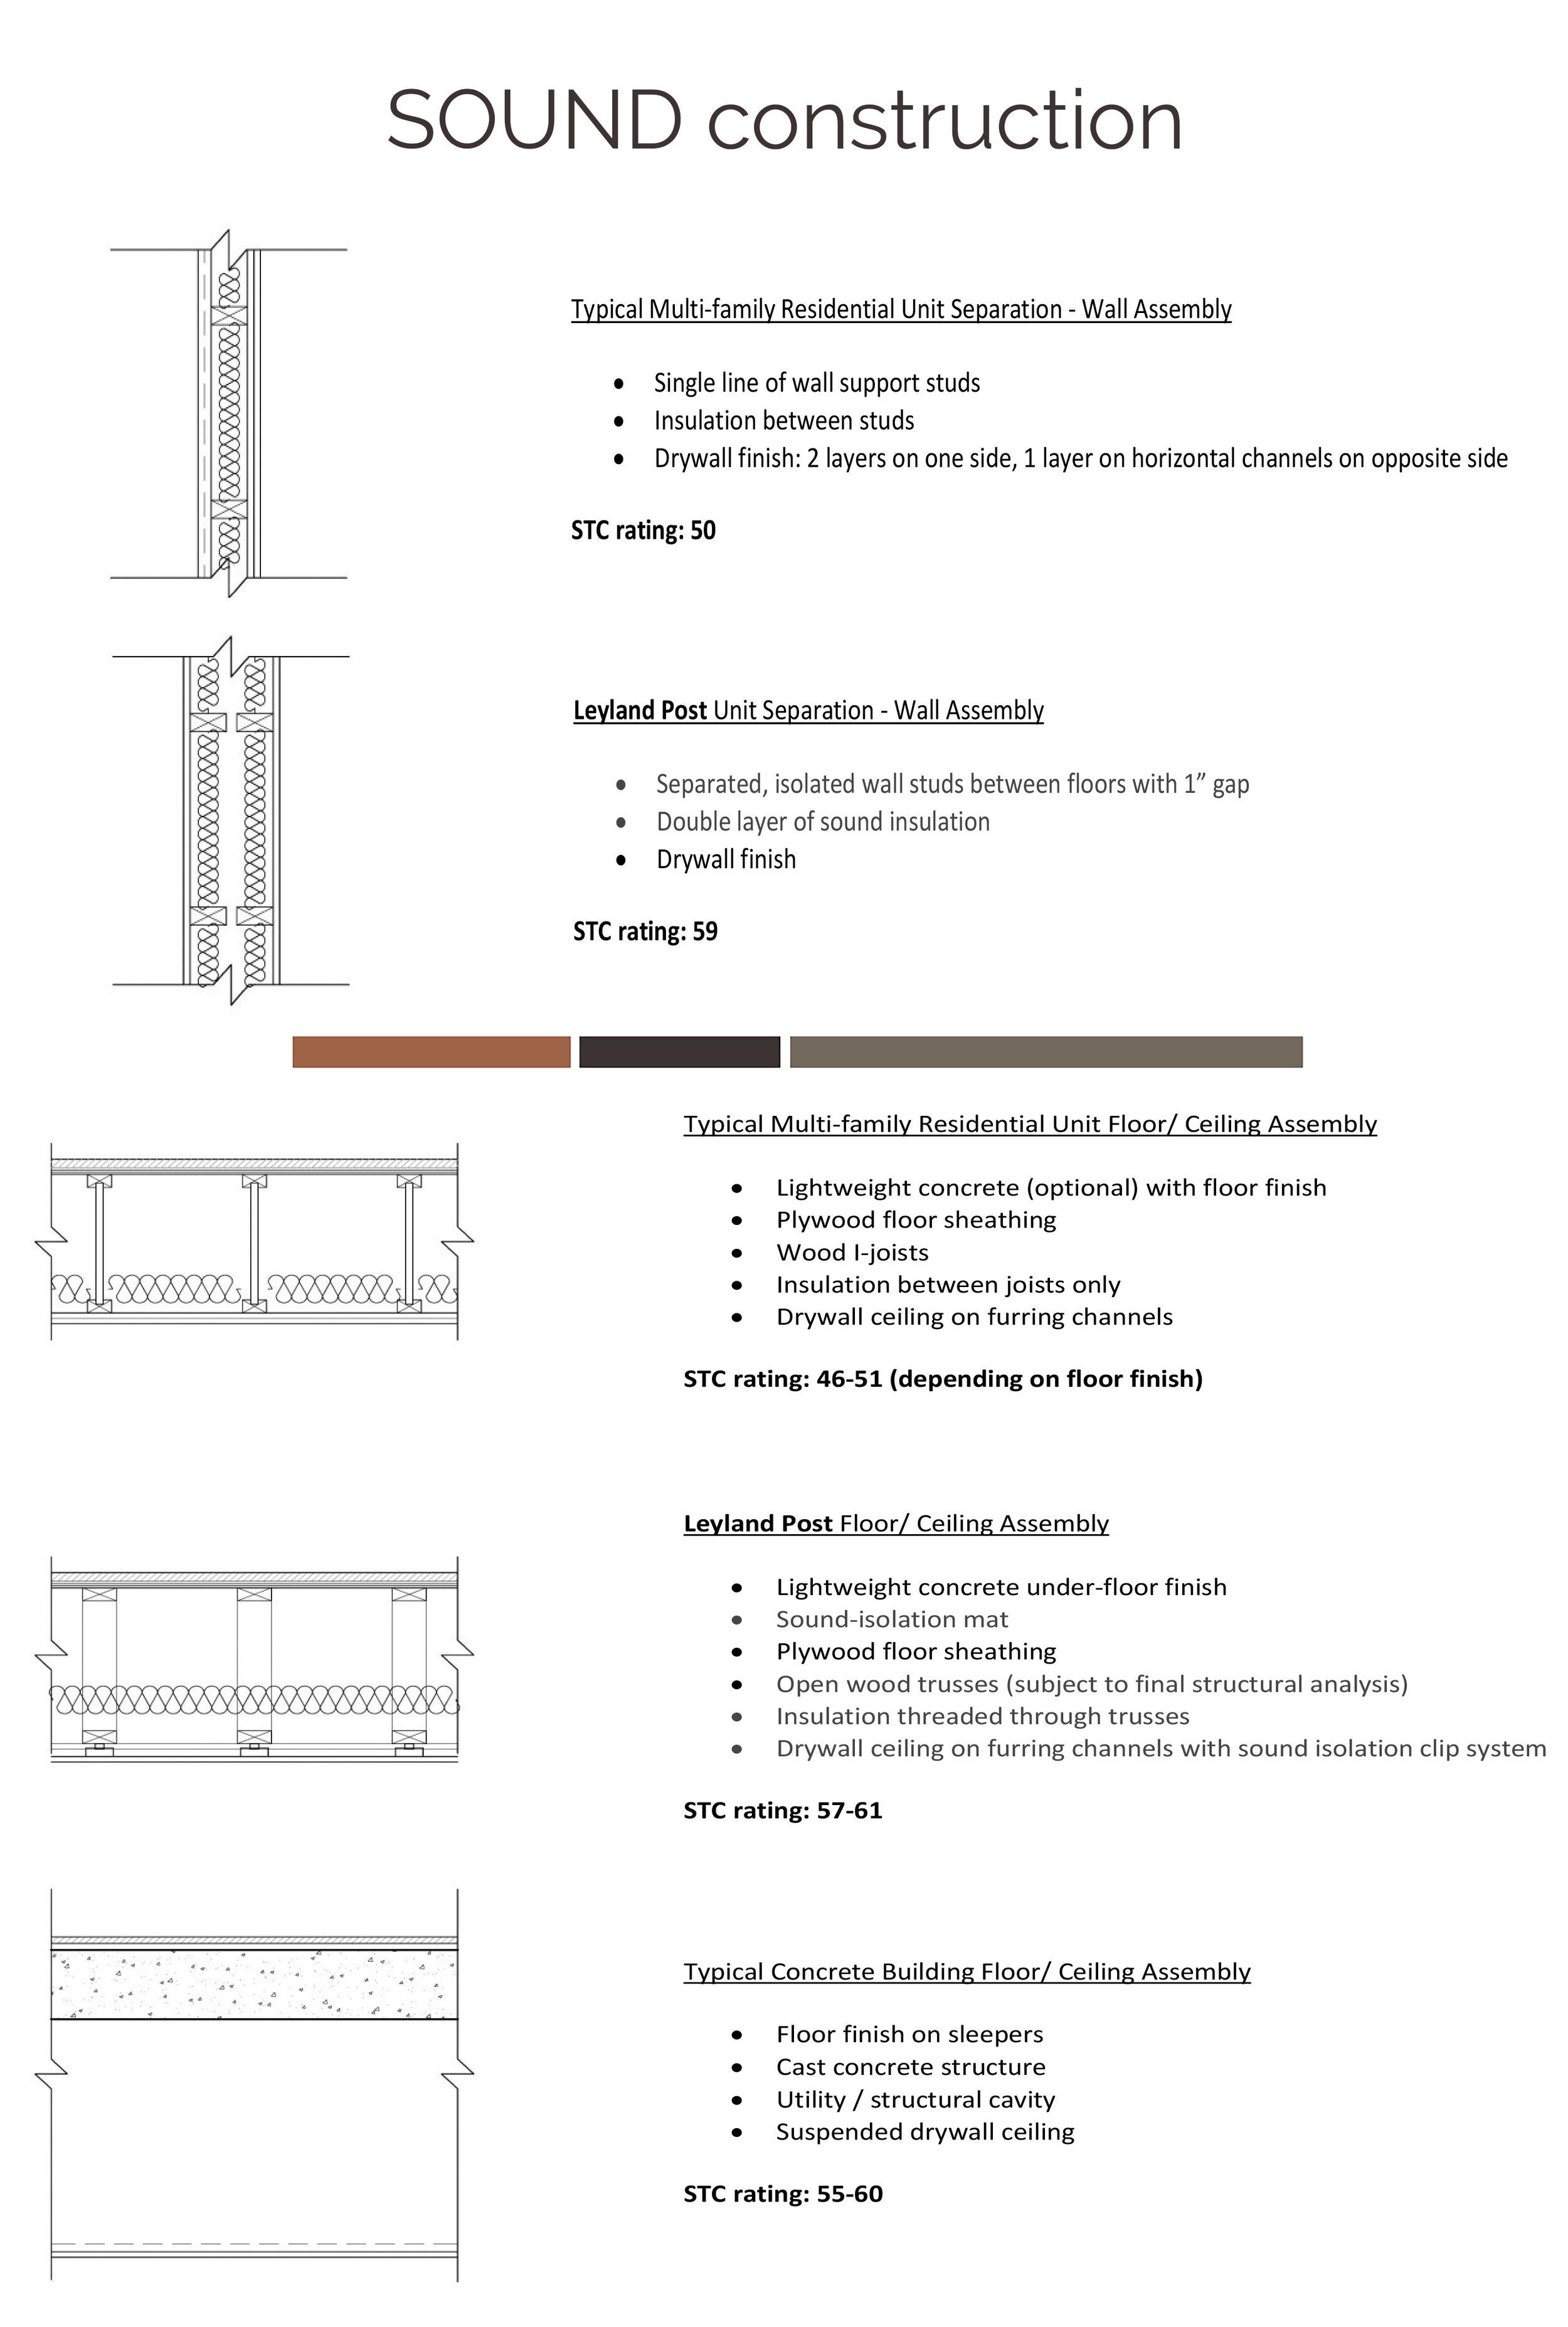 sound construction.jpg